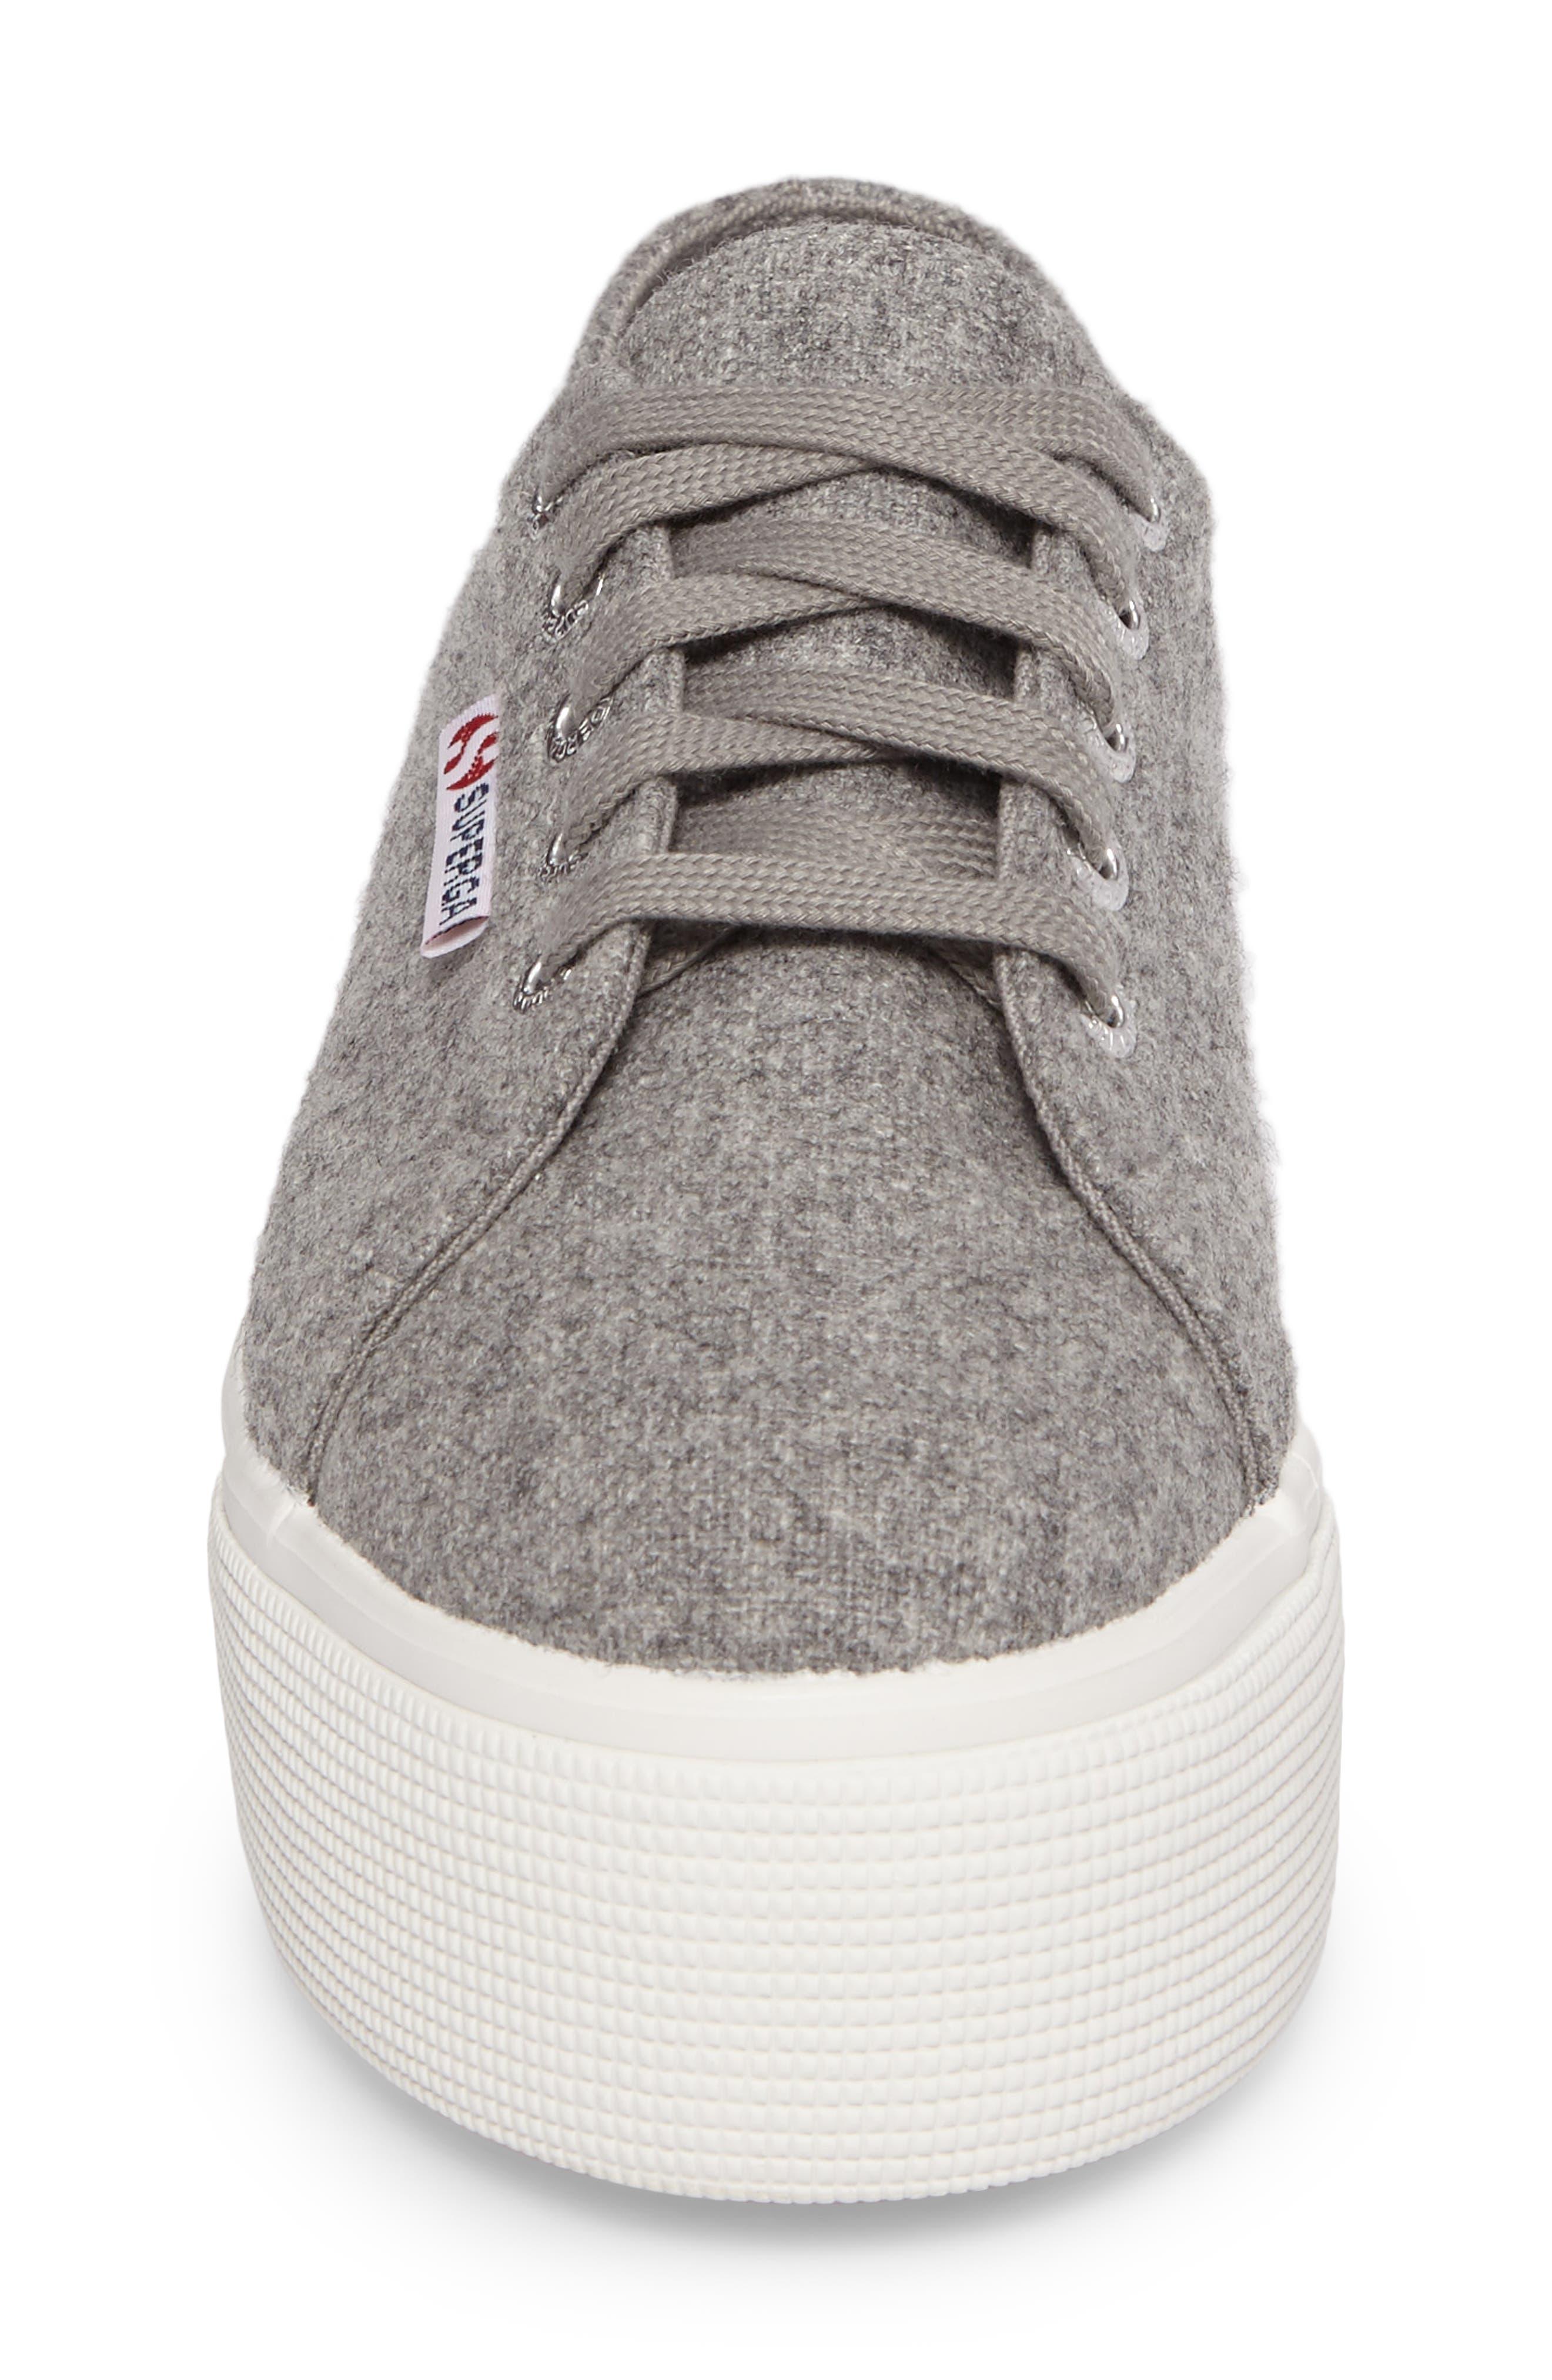 2790 Platform Sneaker,                             Alternate thumbnail 4, color,                             Light Grey Canvas